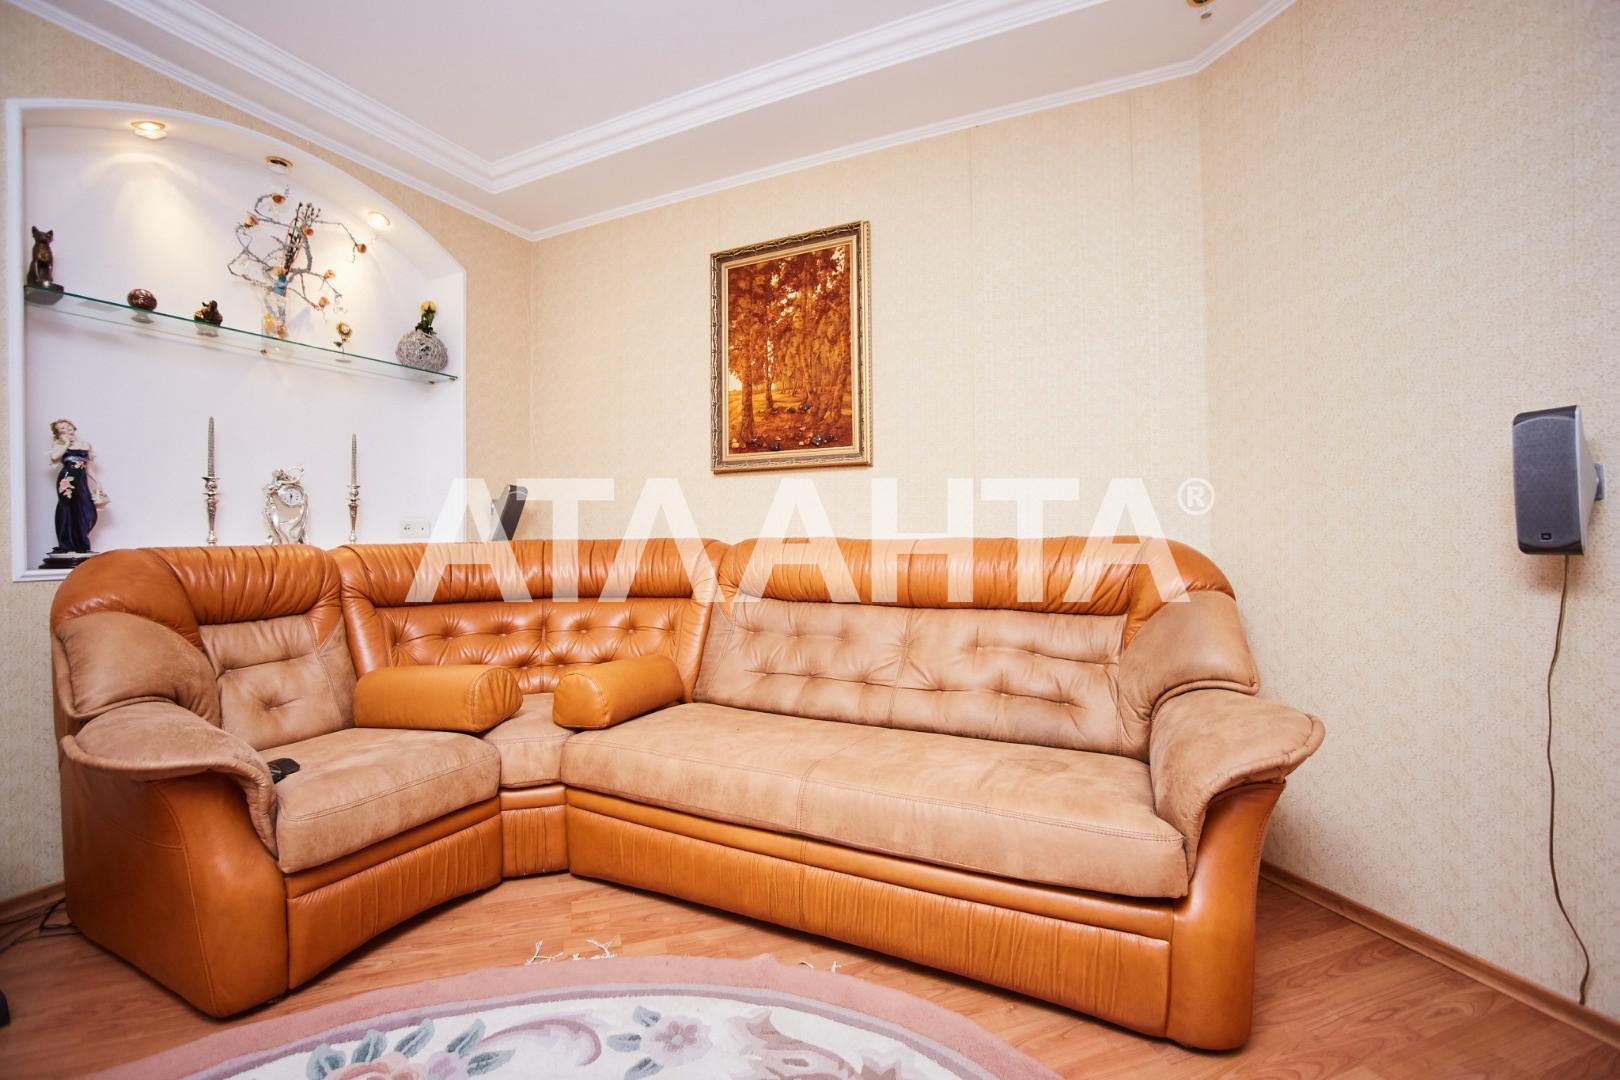 Продается Многоуровневая Квартира на ул. Посмитного — 295 000 у.е. (фото №15)